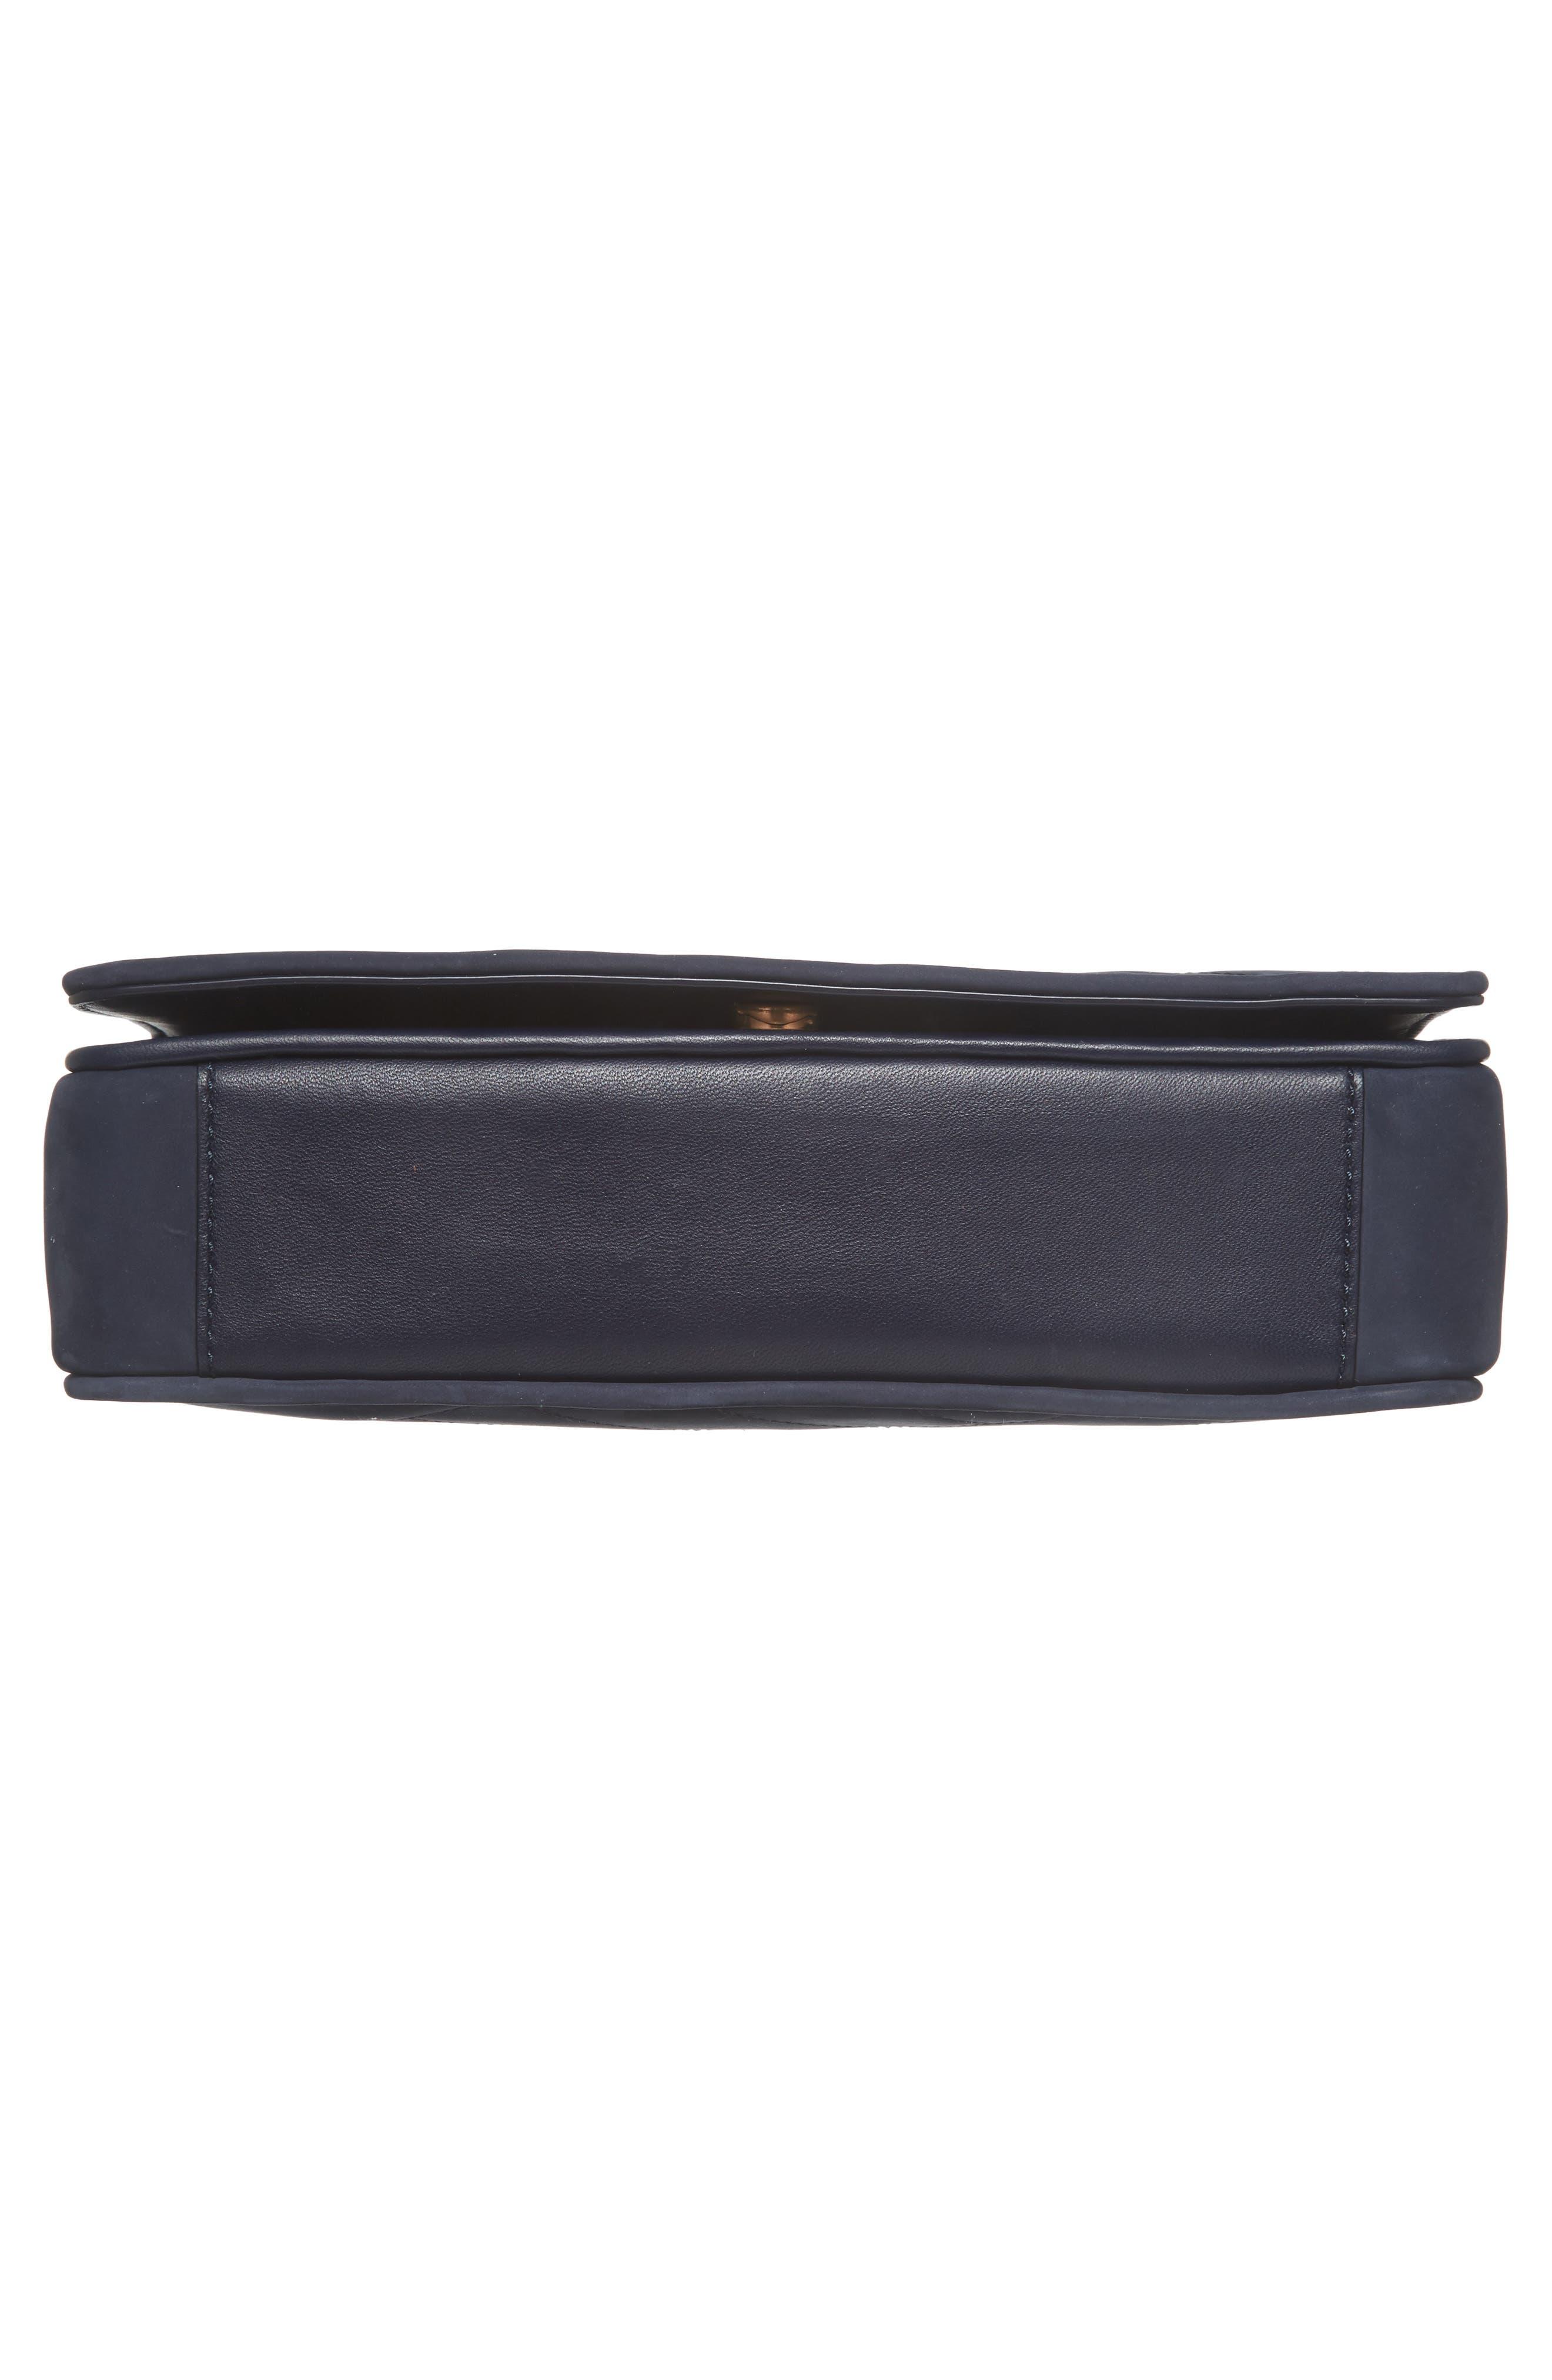 Alexa Leather Shoulder Bag,                             Alternate thumbnail 6, color,                             Royal Navy